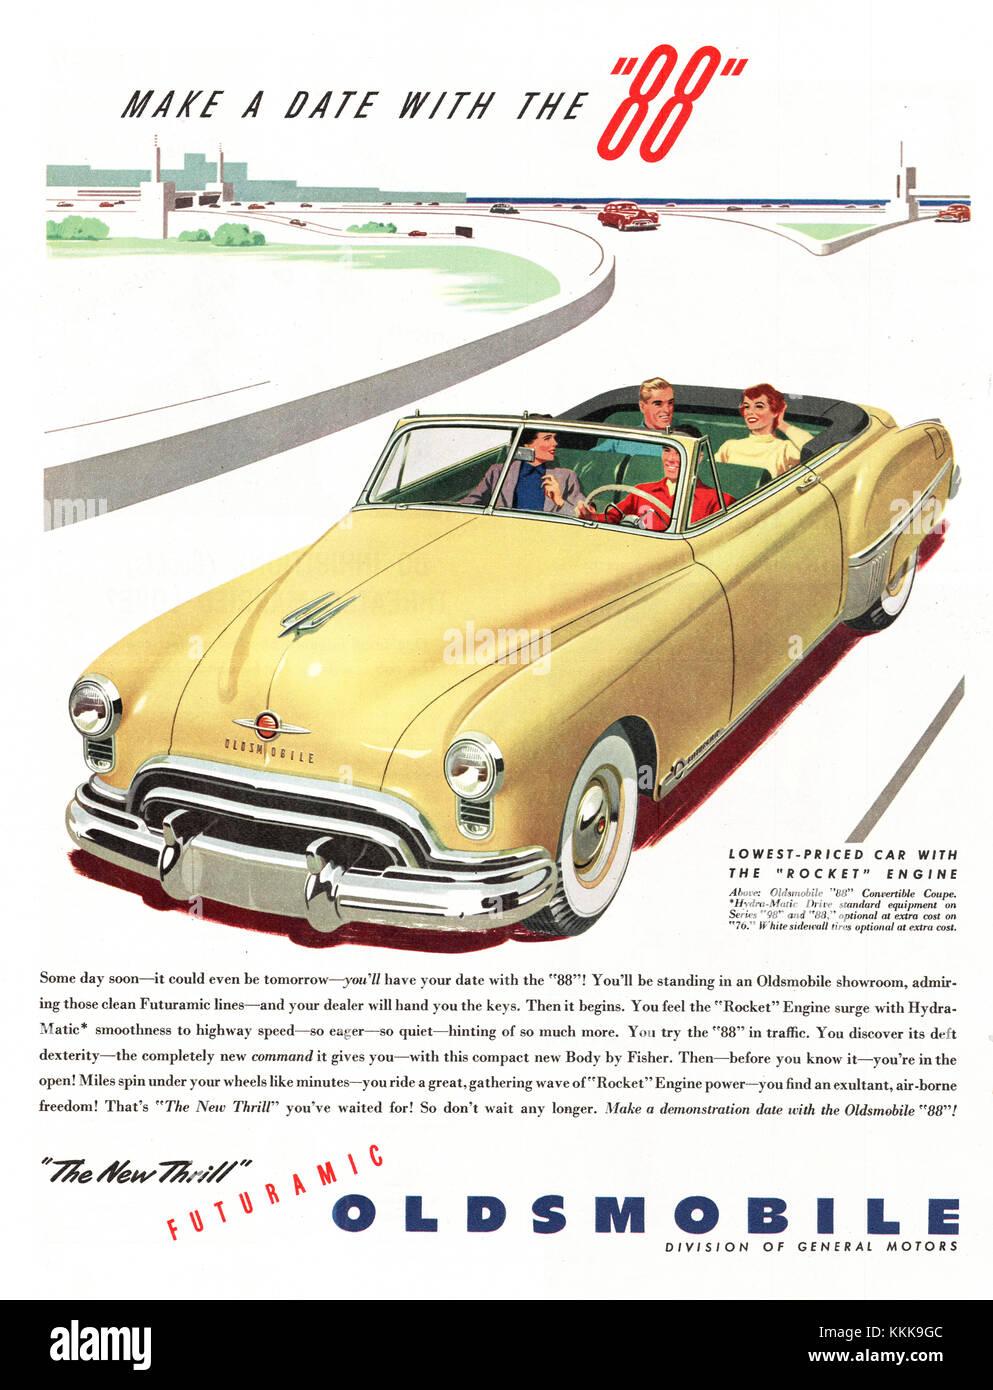 1949 U.S. Magazine Oldsmobile Car Advery - Stock Image